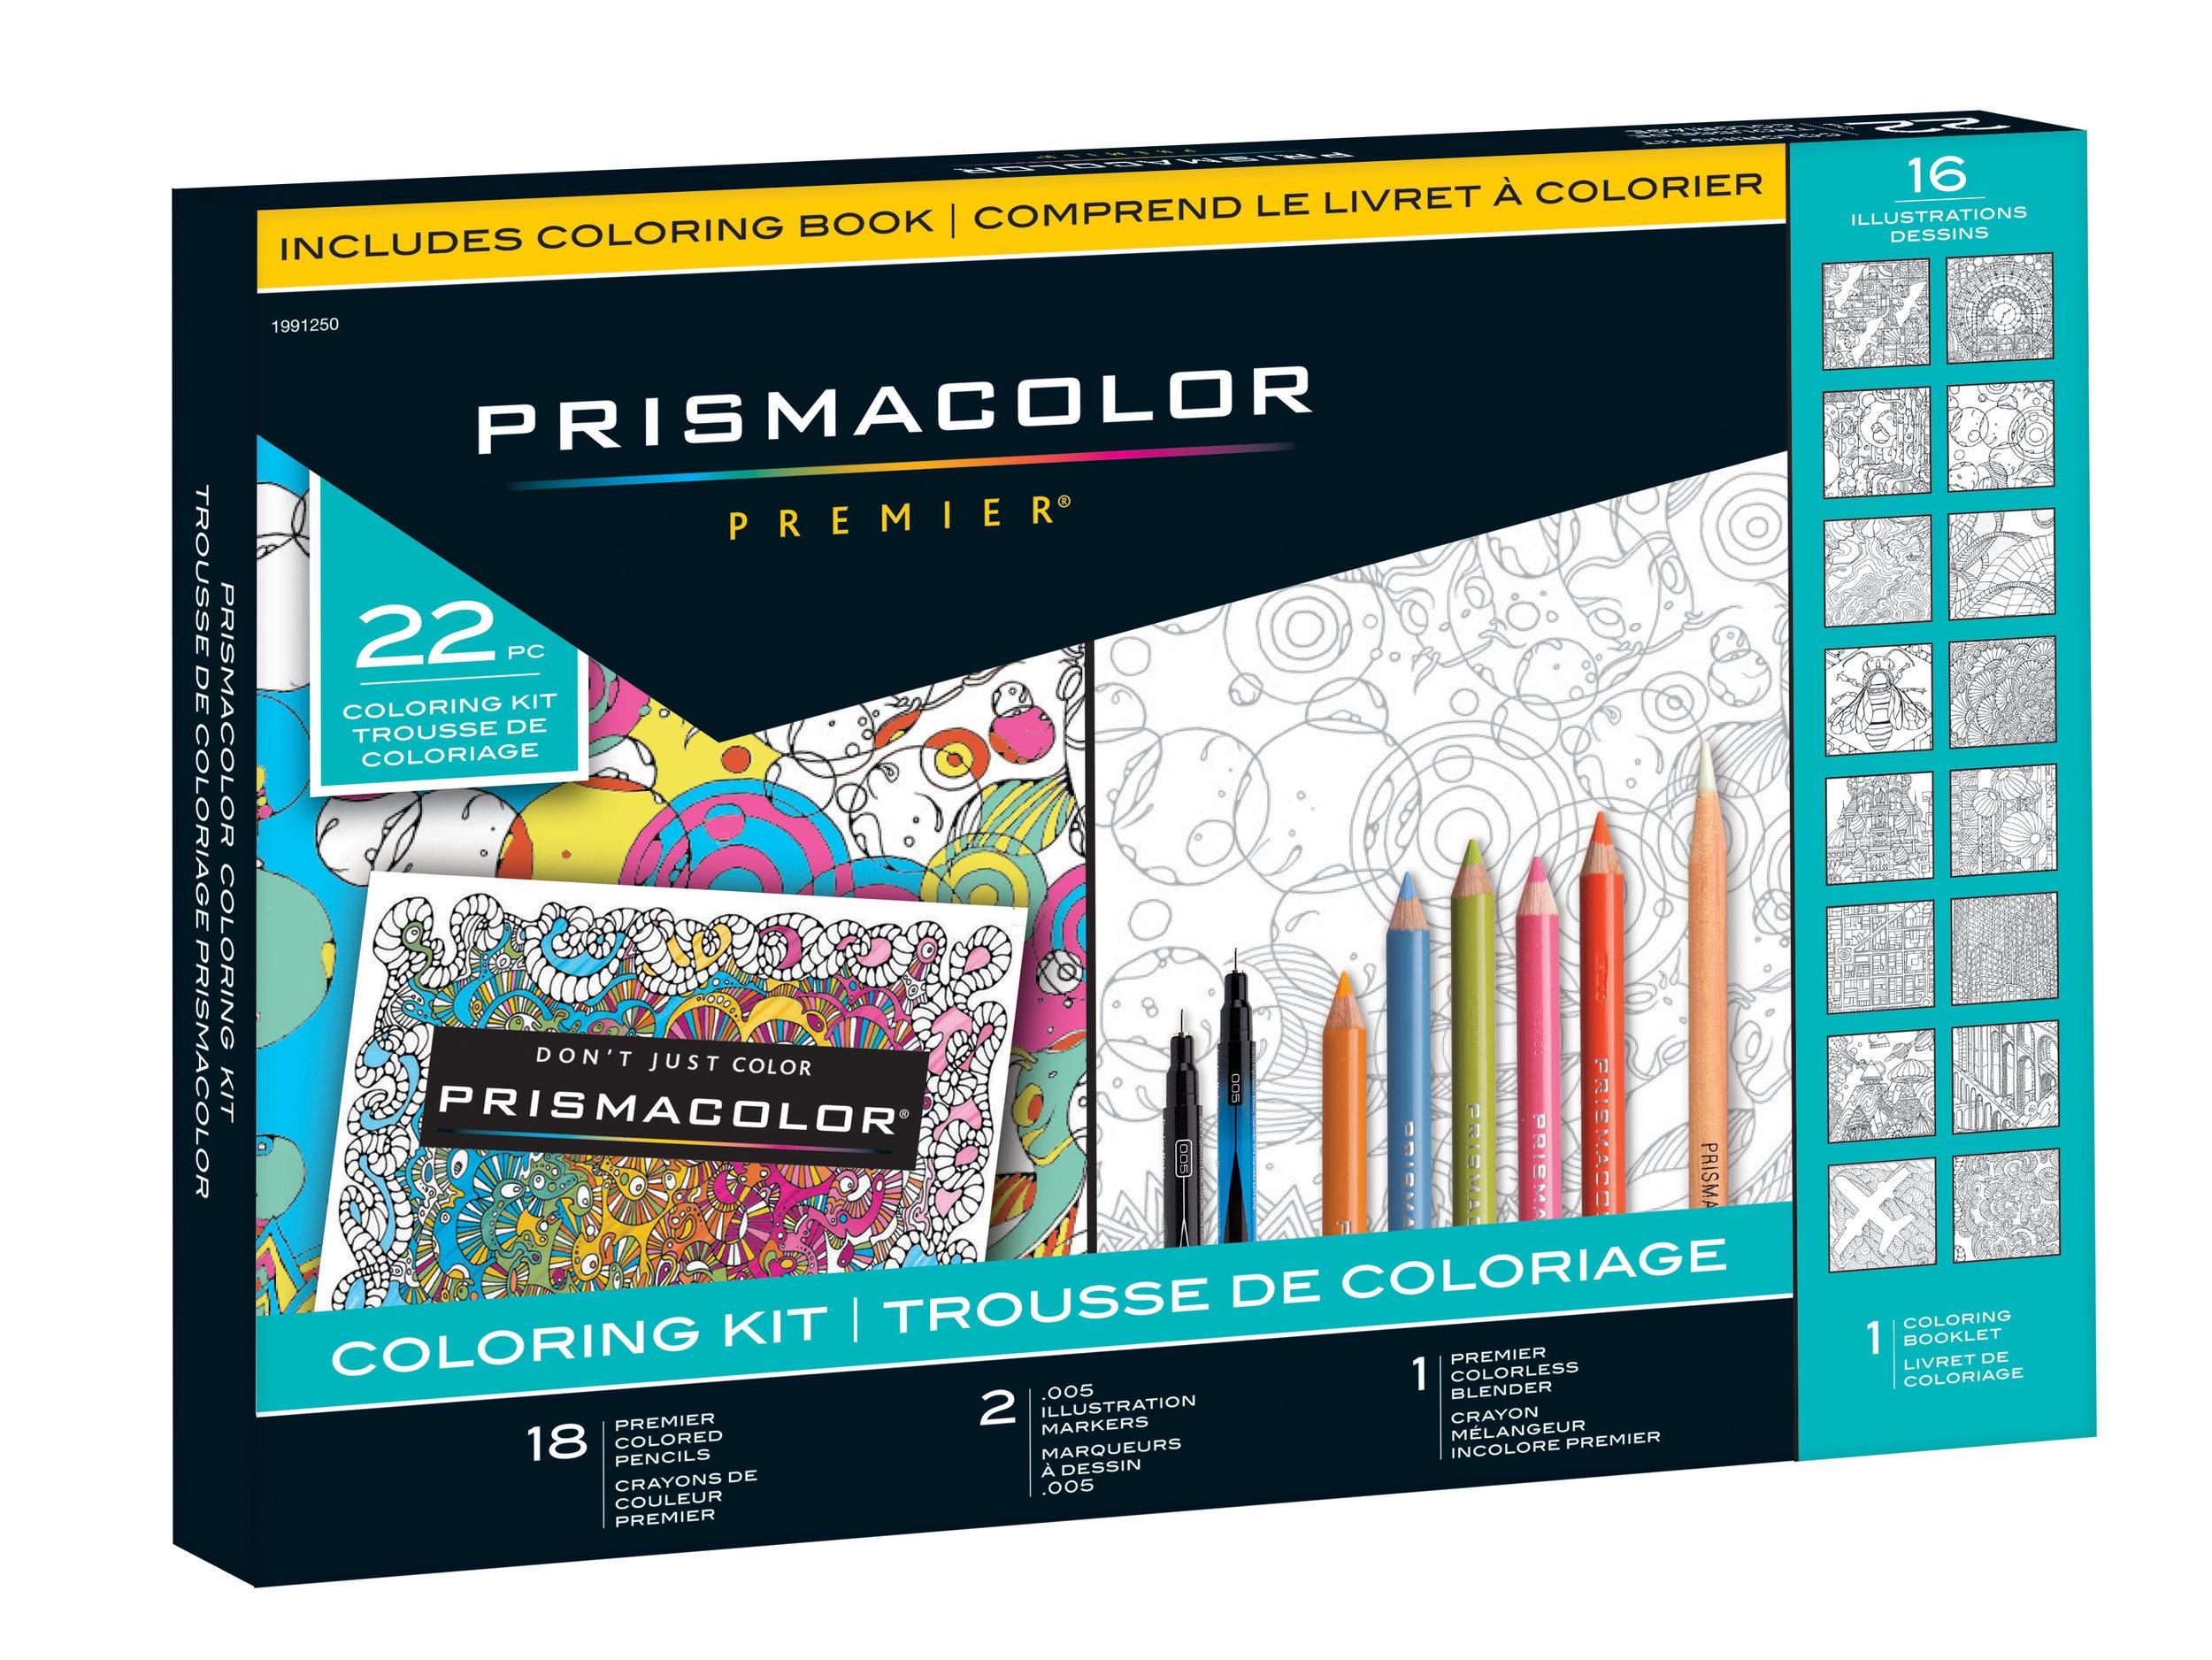 1978739_2001270_PC_Coloring Kit_29pc_Concept_v6_RENDER_FINAL_Front.jpg